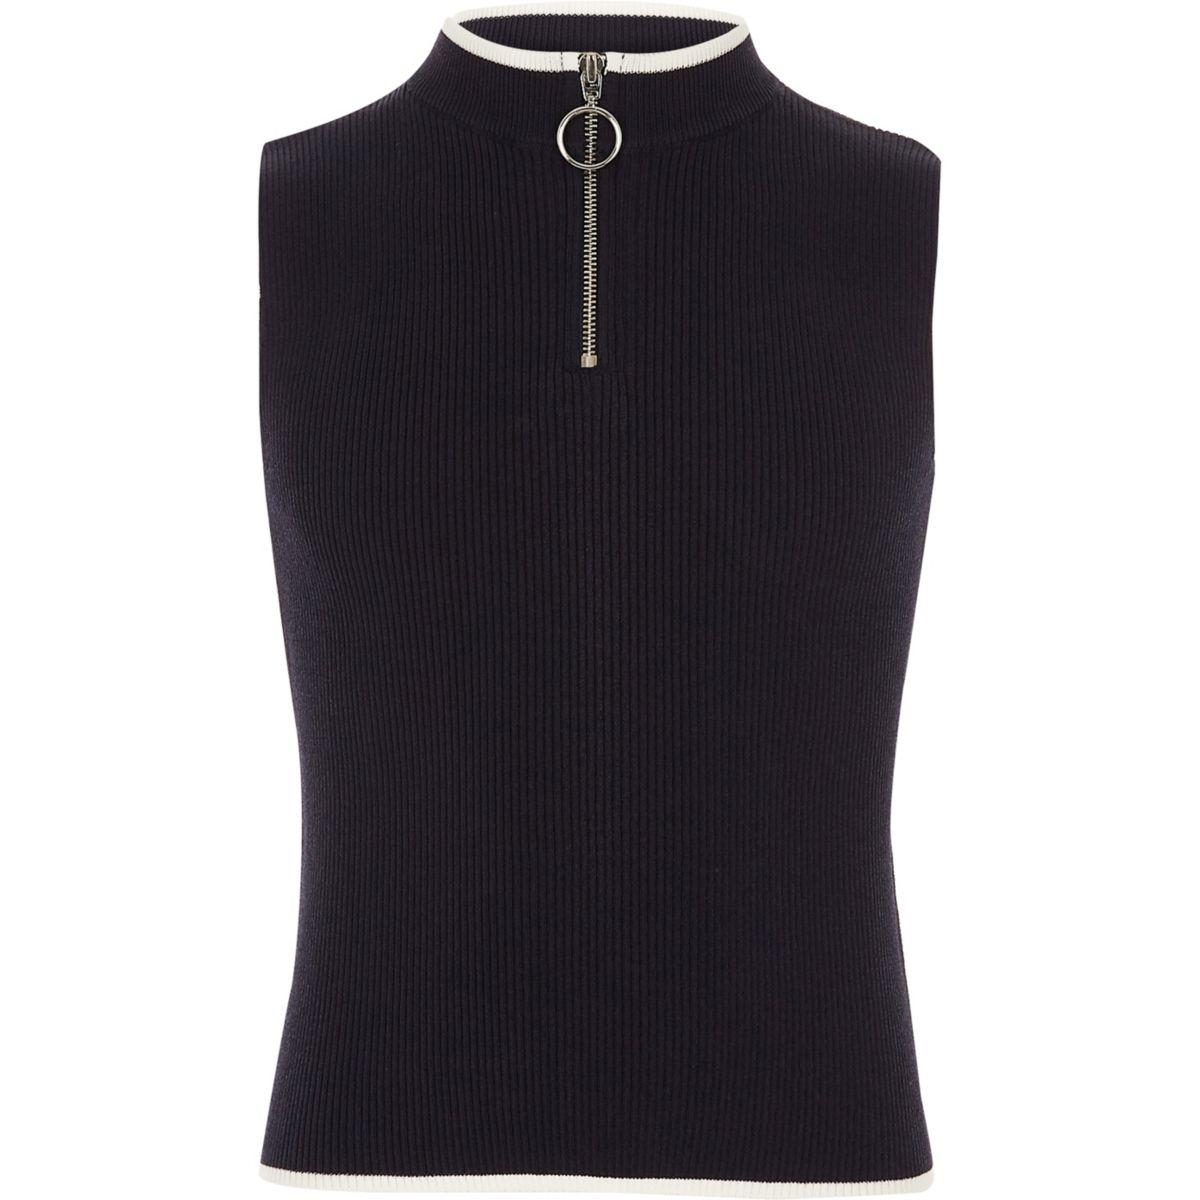 Girls navy rib knit zip neck tank top